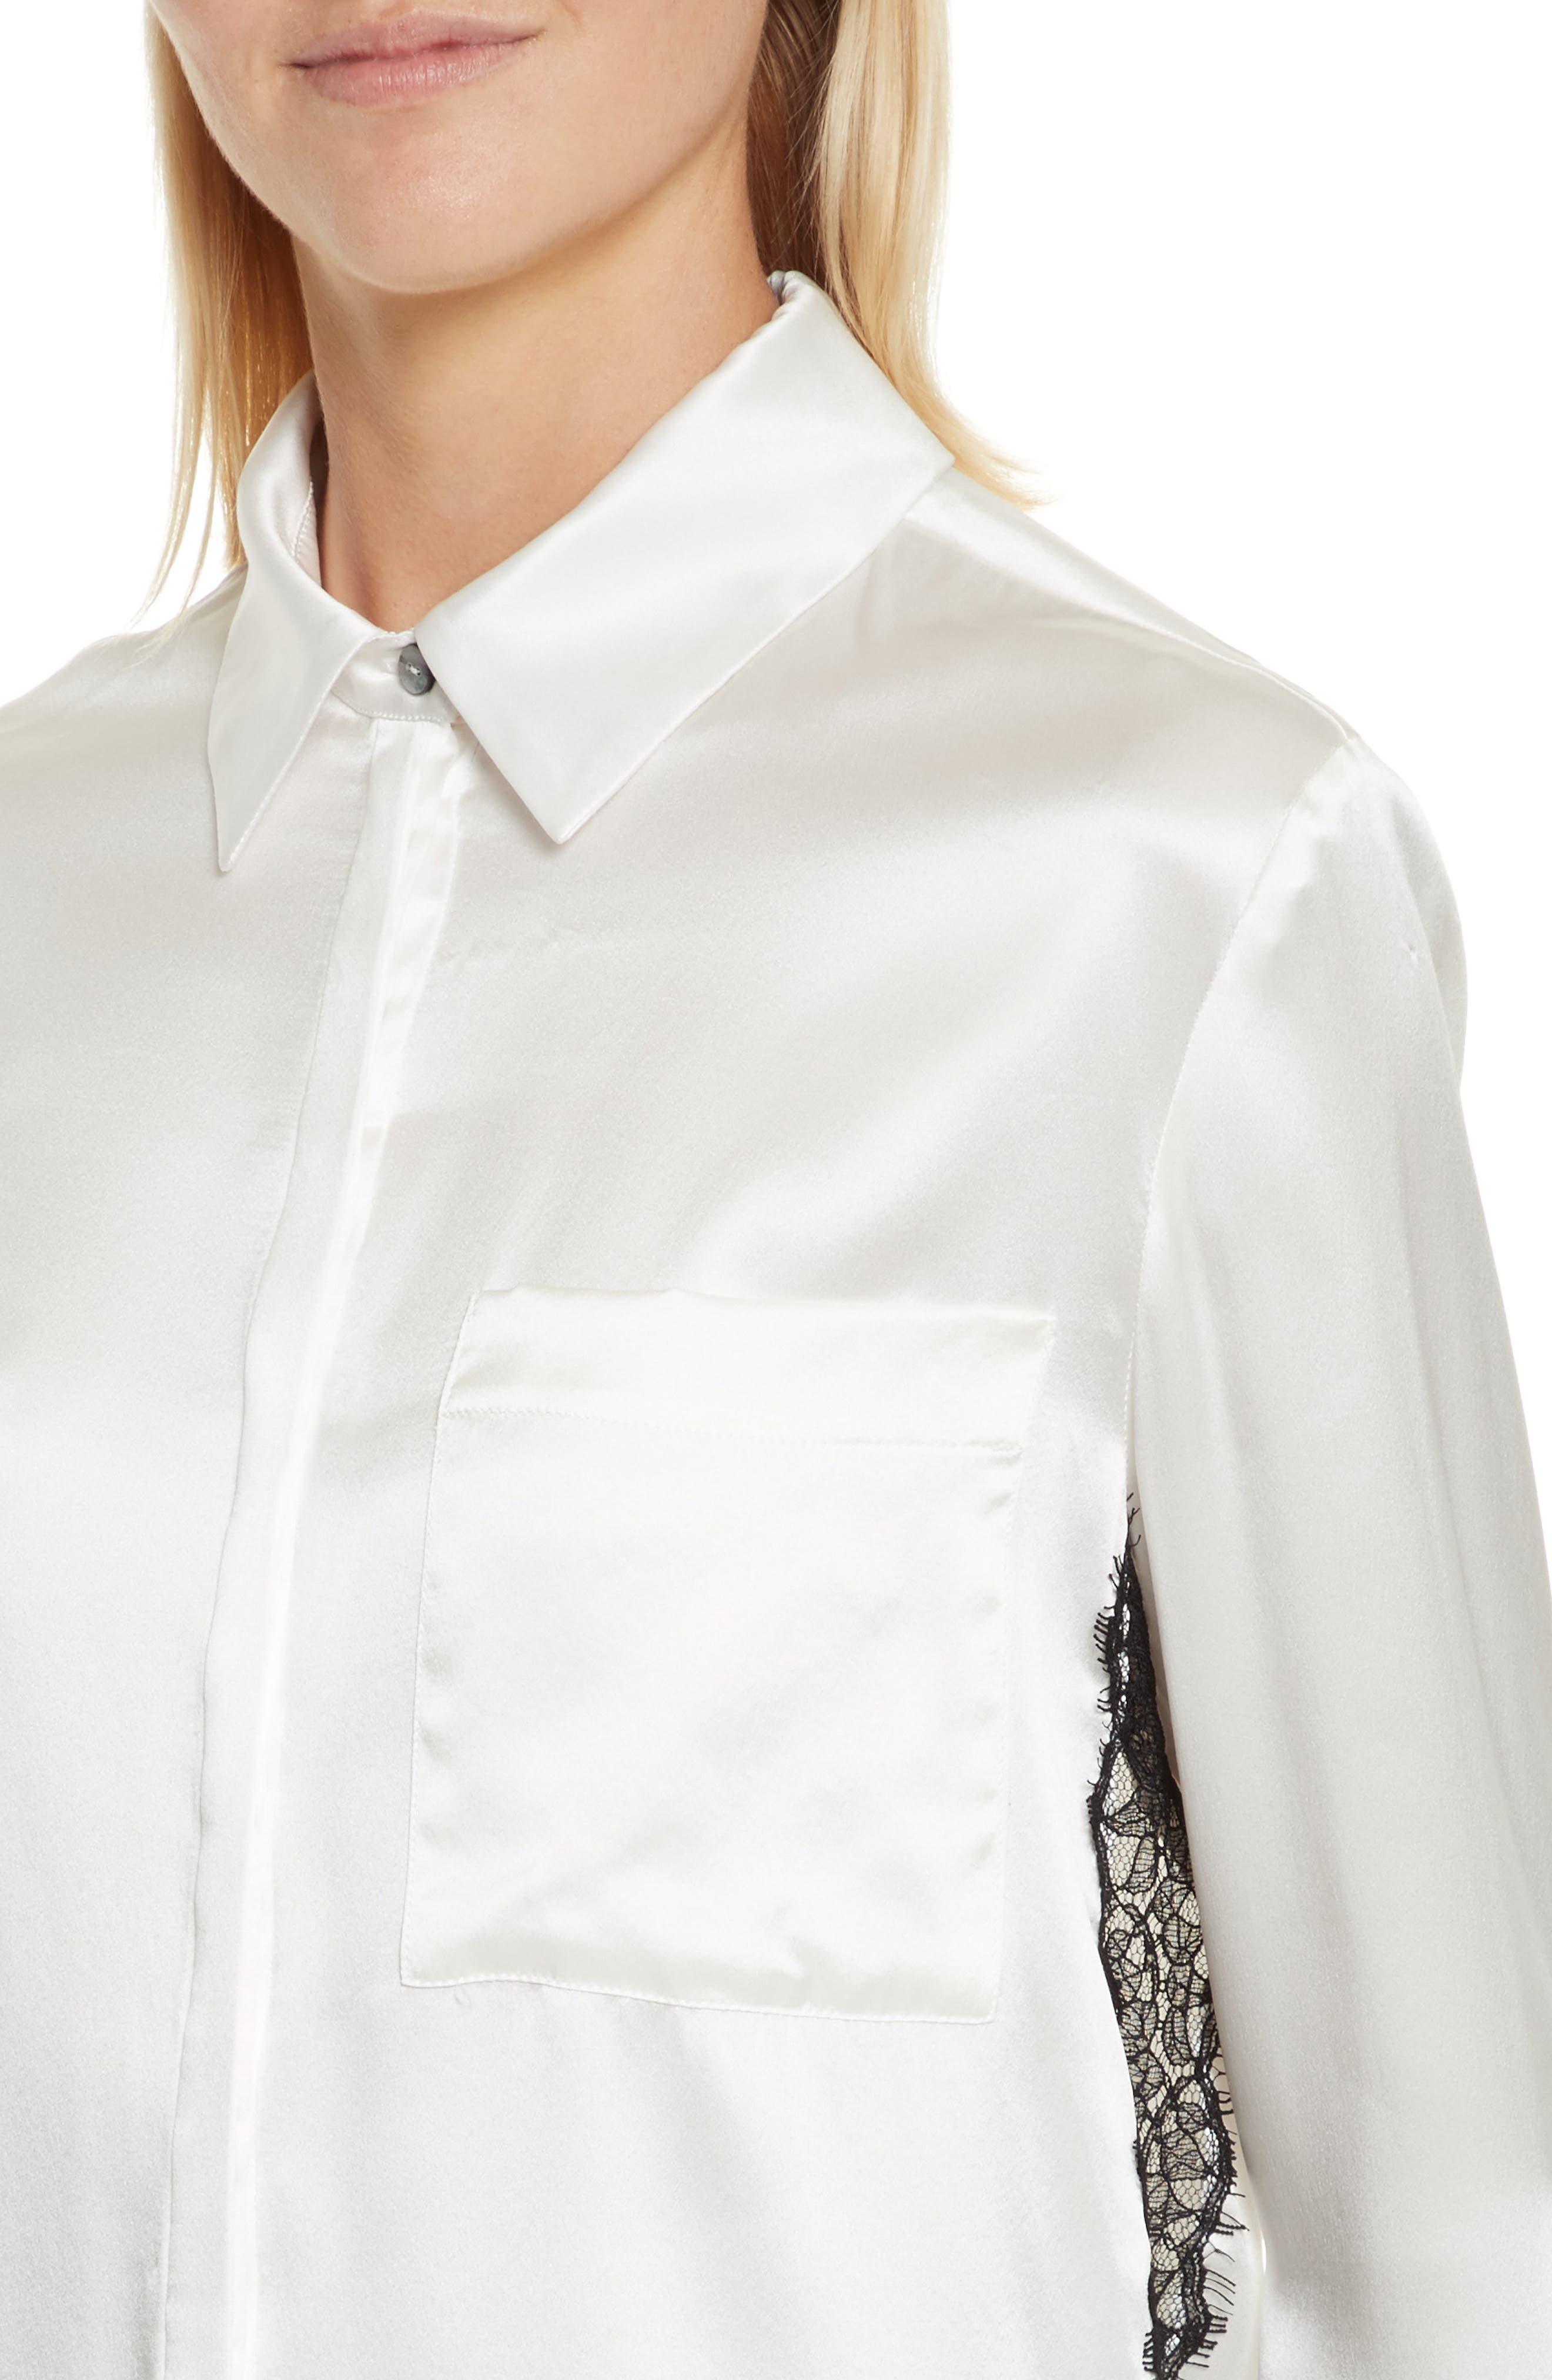 Korlan Lace Trim Silk Top,                             Alternate thumbnail 4, color,                             Ivory/ Black